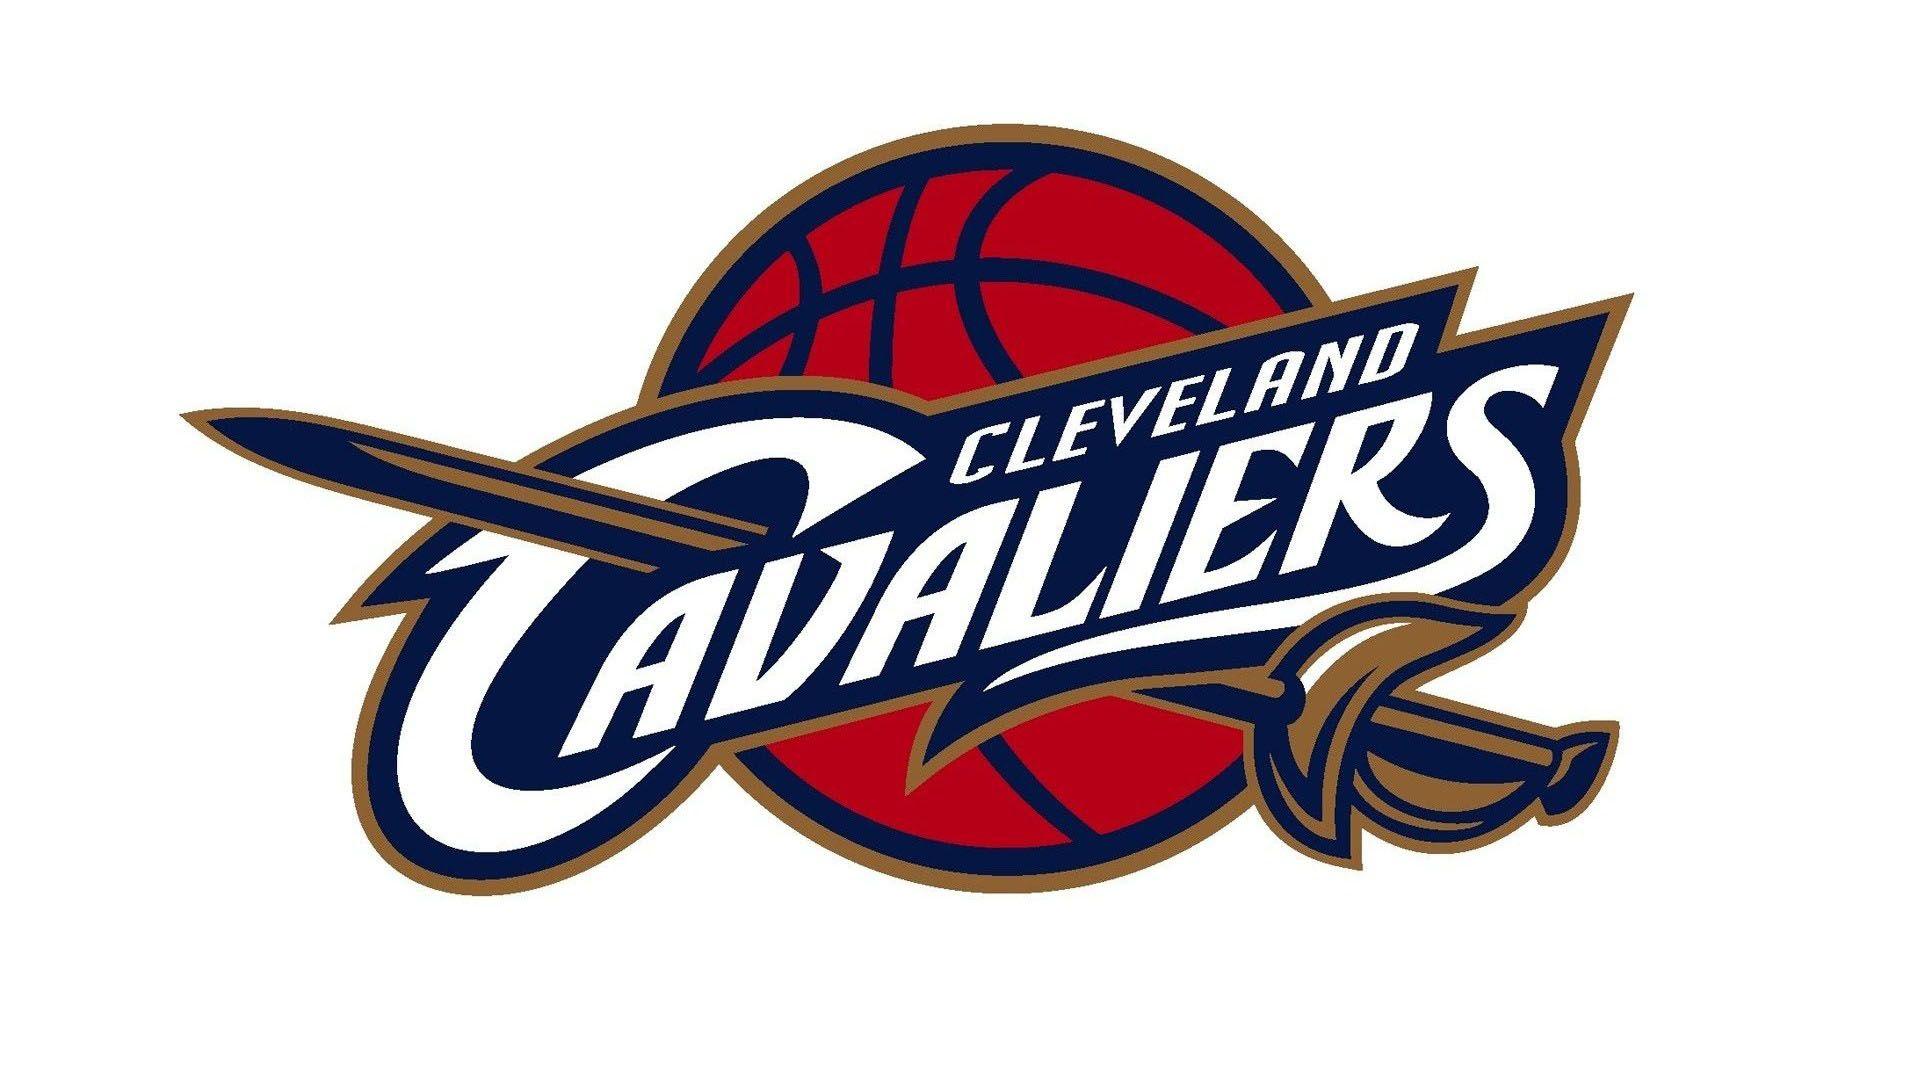 Cavs Mobile Wallpaper Best Wallpaper Hd National Basketball Association Logo Basketball Cleveland Cavaliers Logo